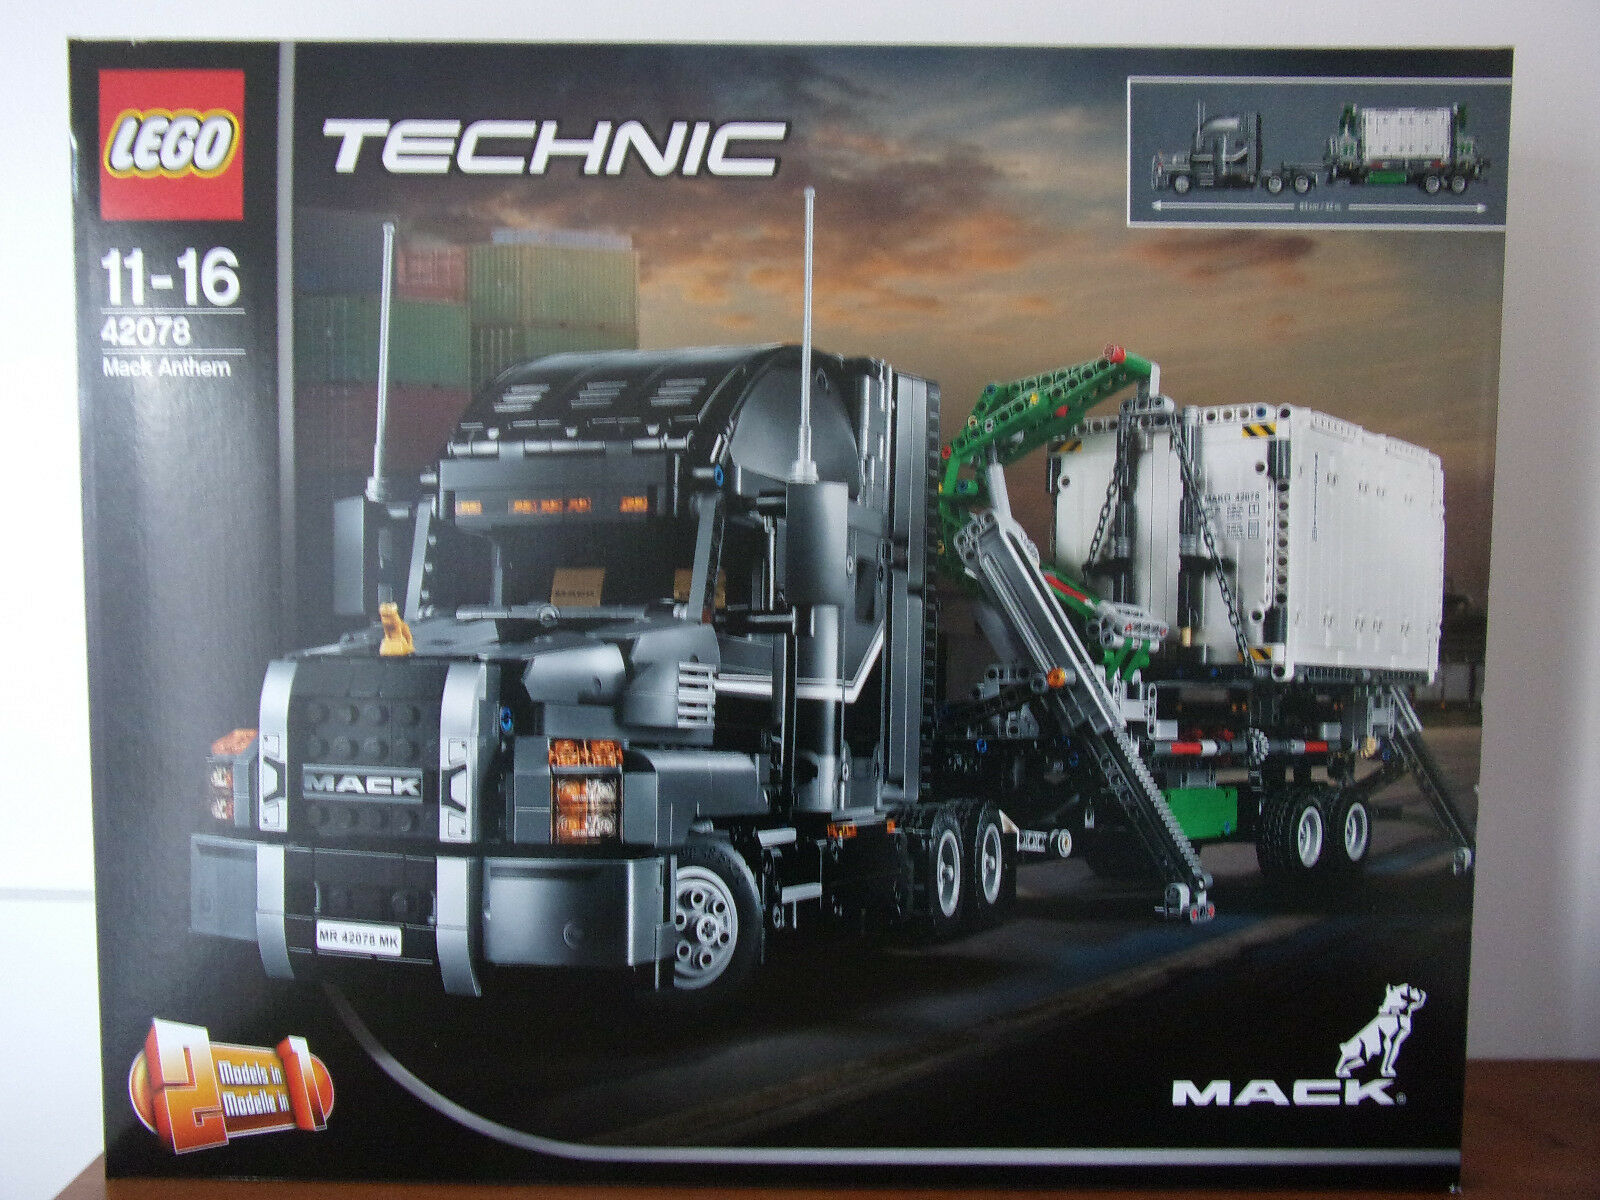 Lego Technic 42078 Mack Anthem (2 en 1) - Nuevo y Emb. Orig.